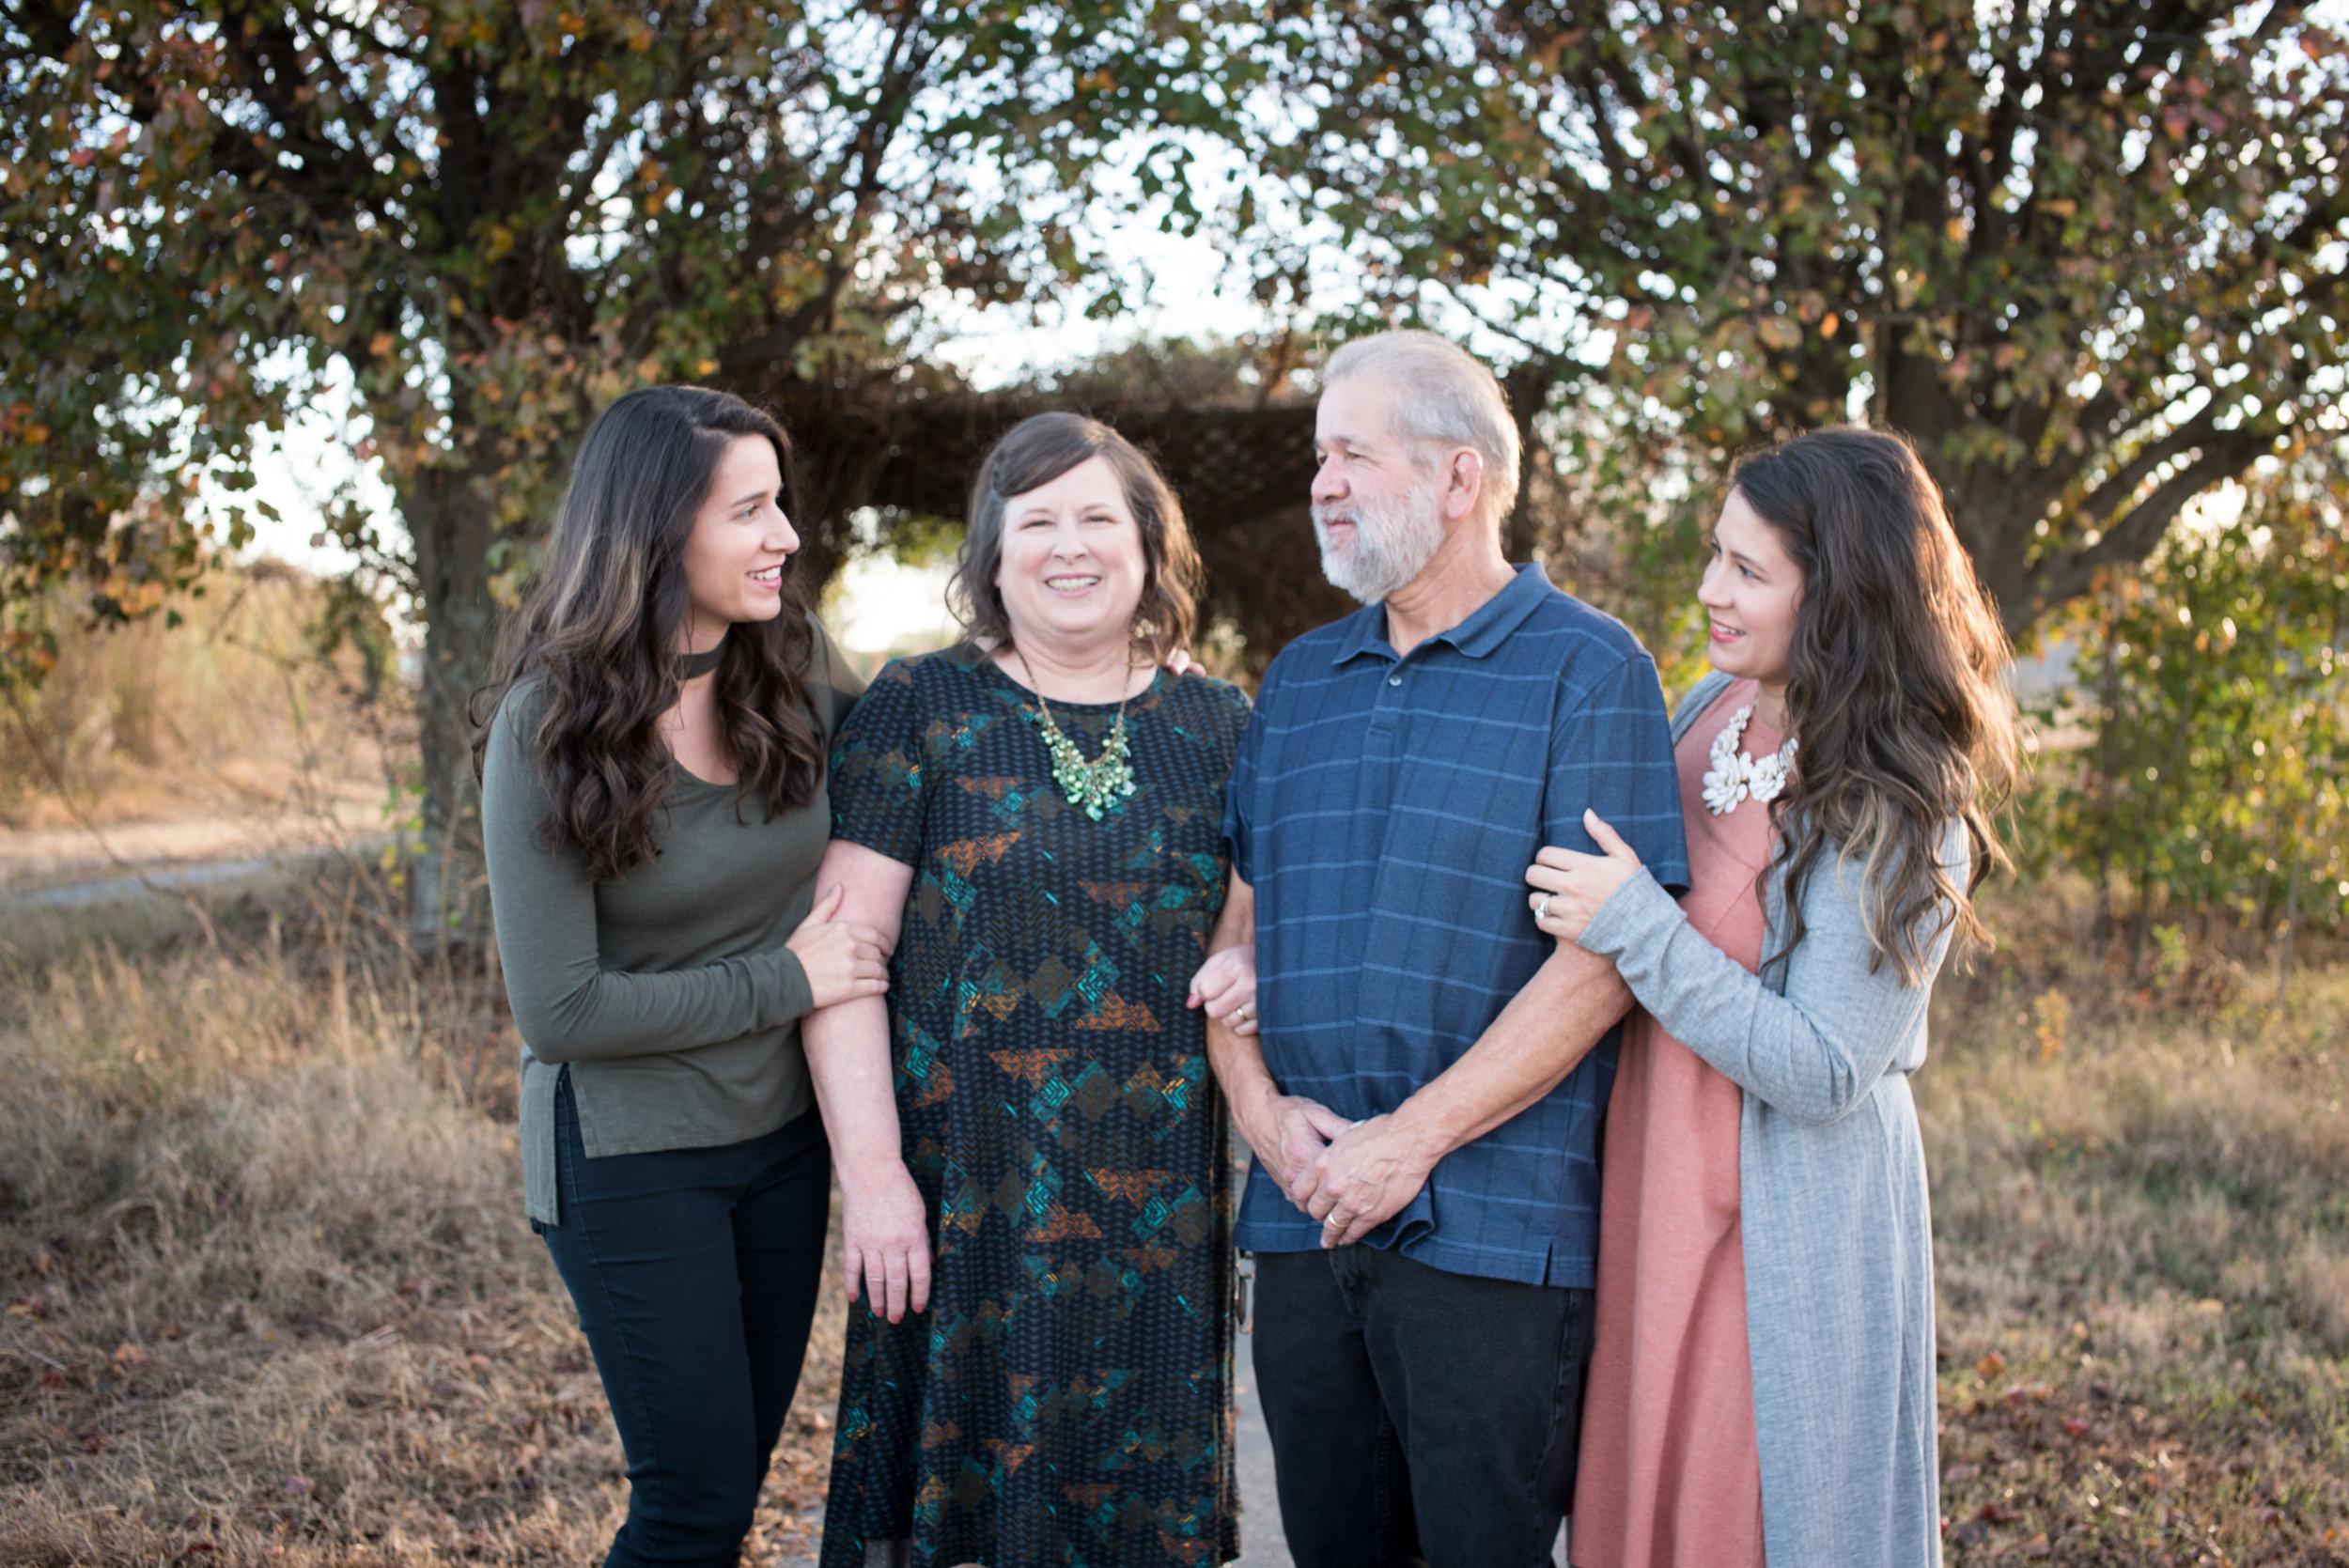 mmilesfamily-4.jpg